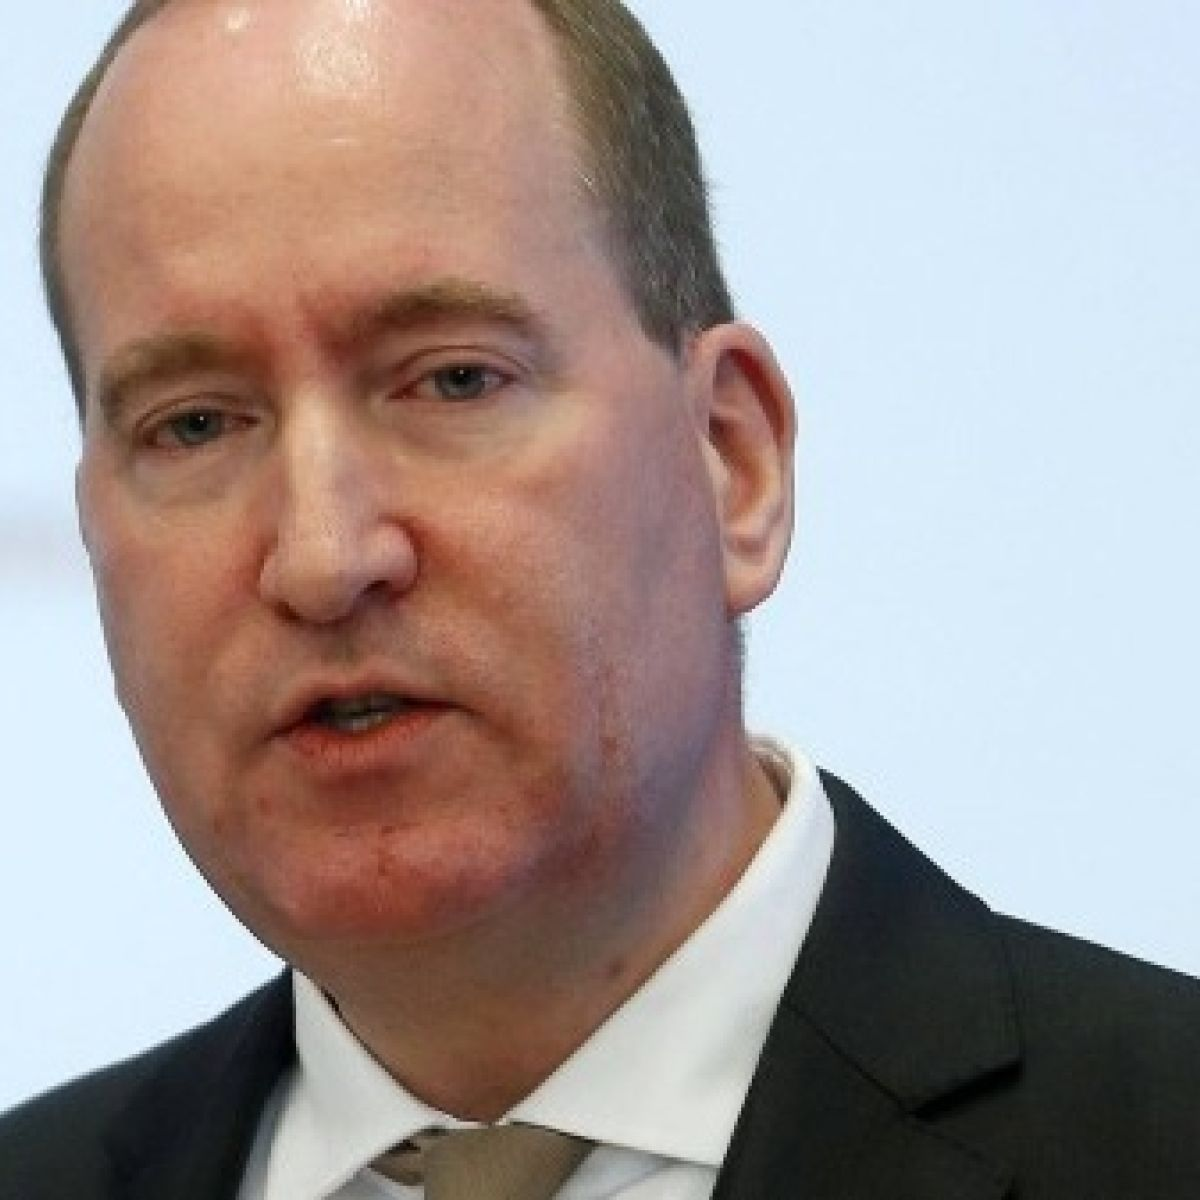 German business 'unwavering' in support for Brexit backstop